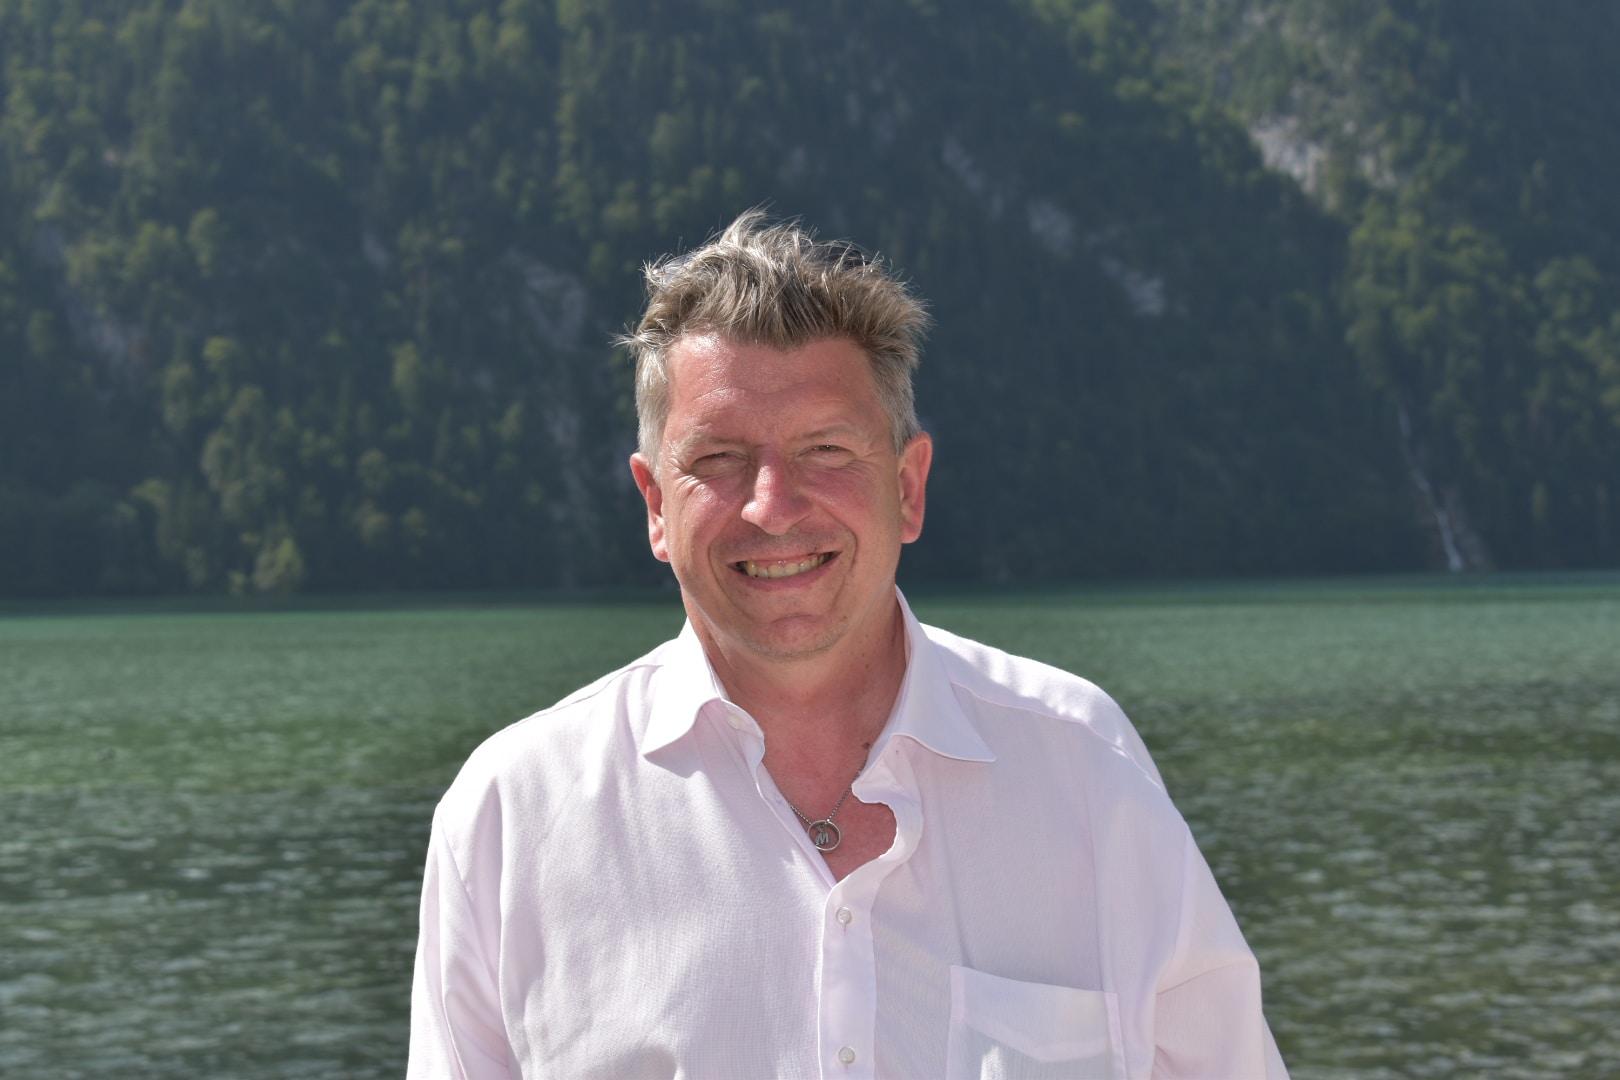 Go to Waldemar Brandt's profile